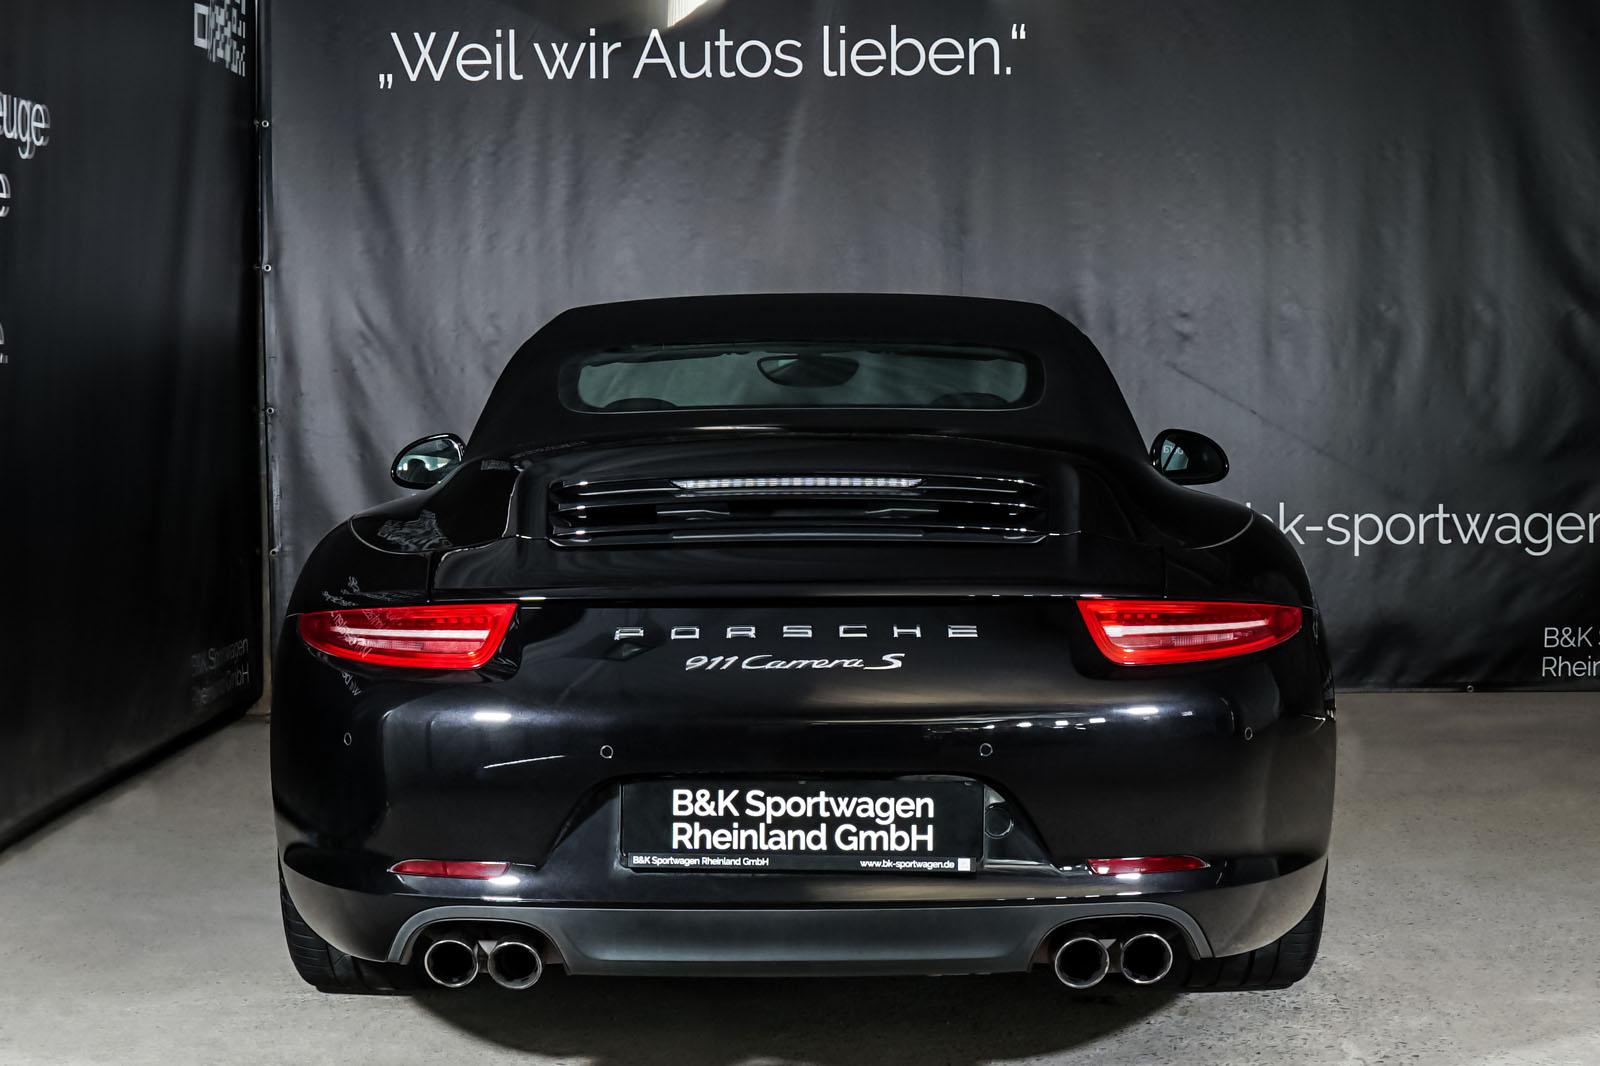 Porsche_991_CarreraS_Cabrio_Schwarz_Schwarz_POR-7555_22_w